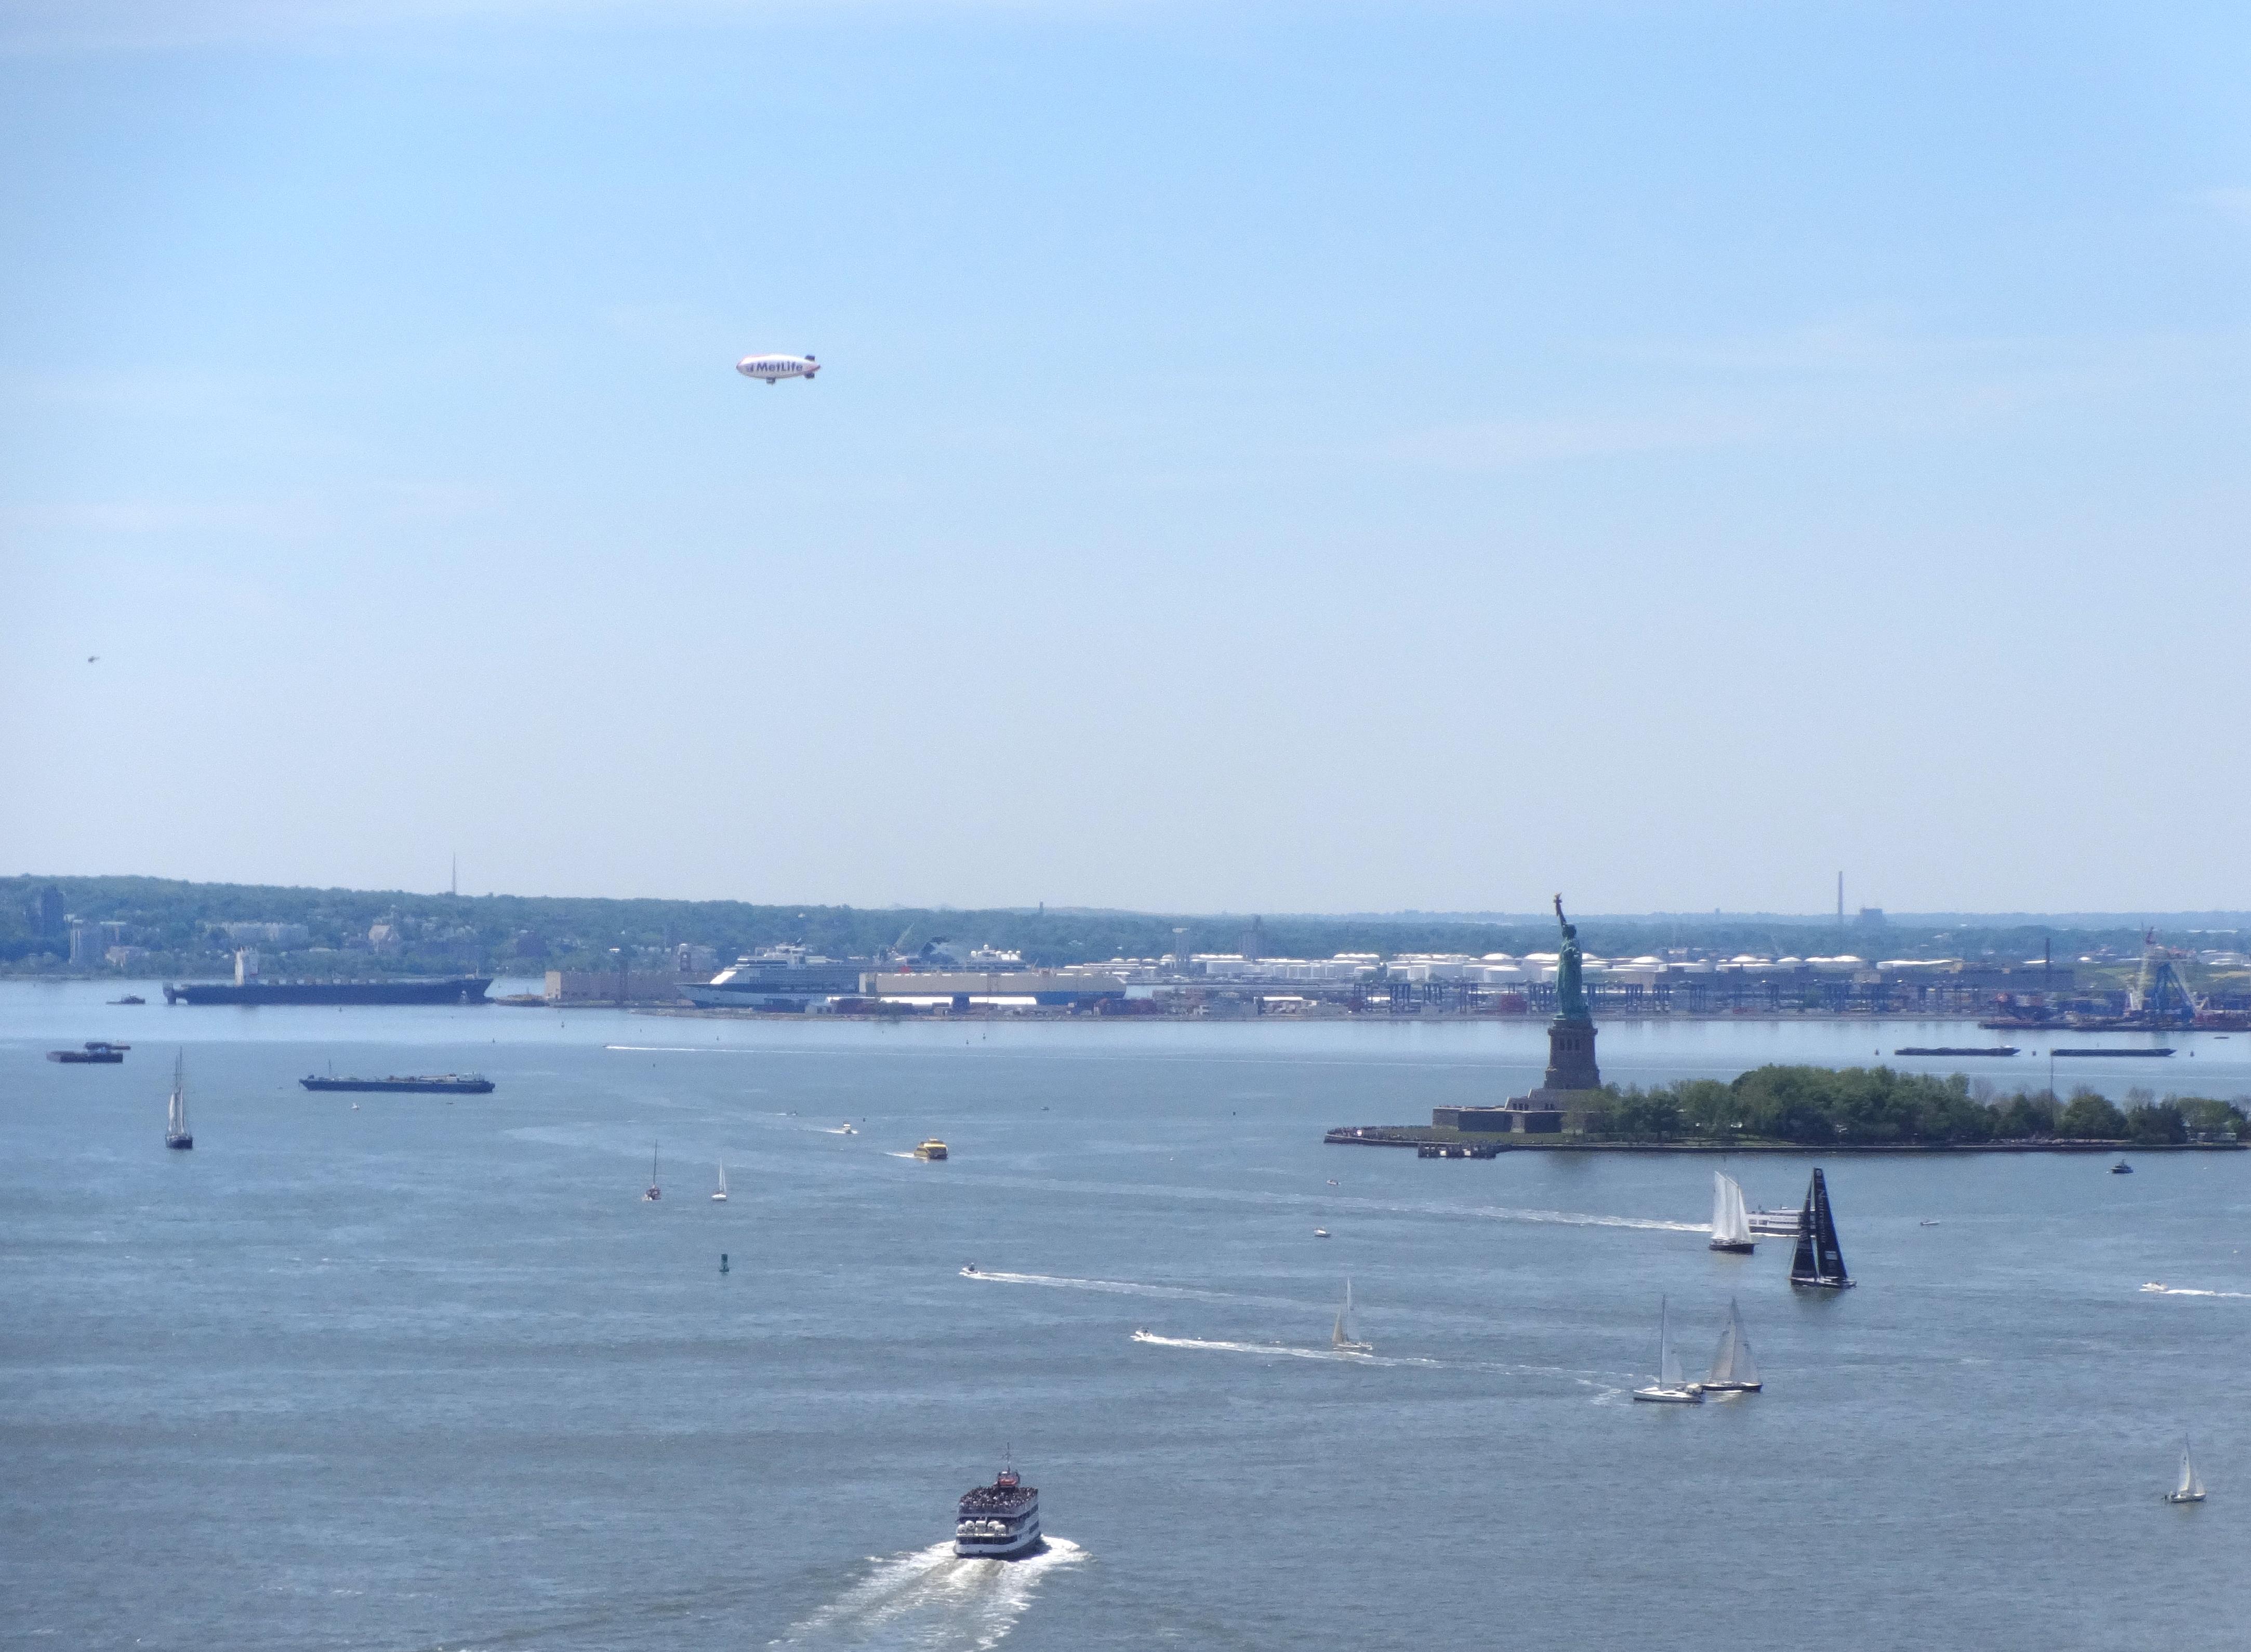 New York Harbor blimp sailboats 6-1-2014